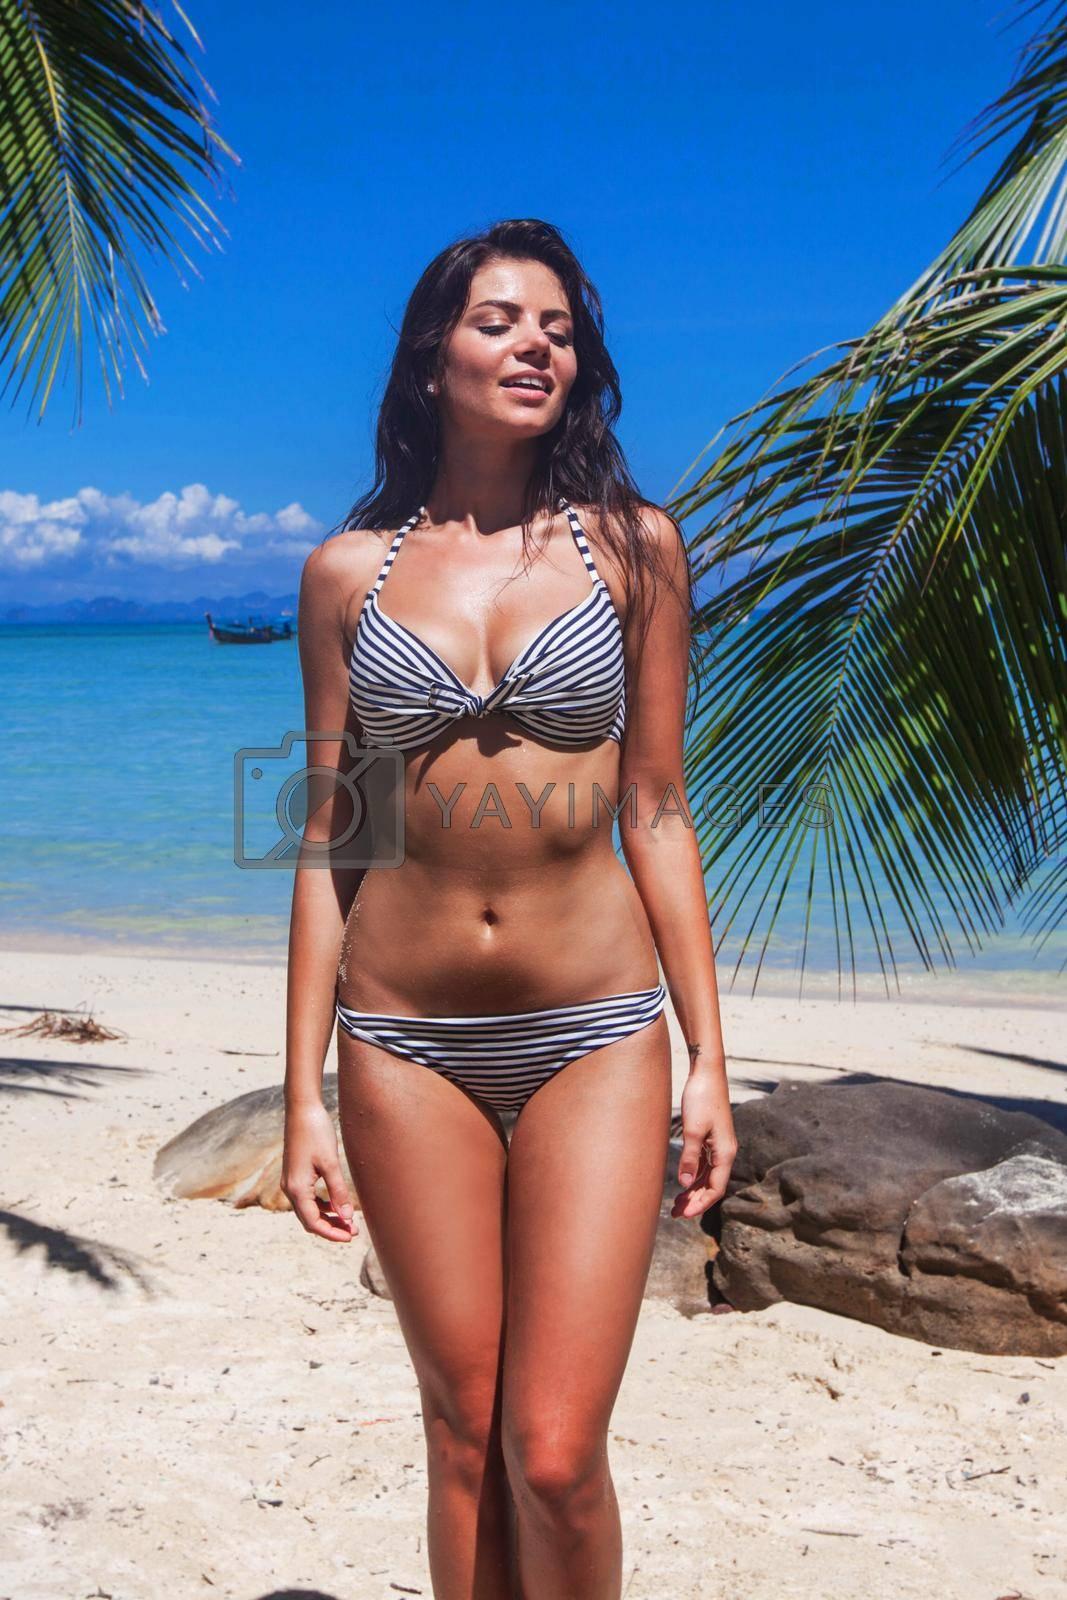 Happy woman in bikini on beach in Thailand